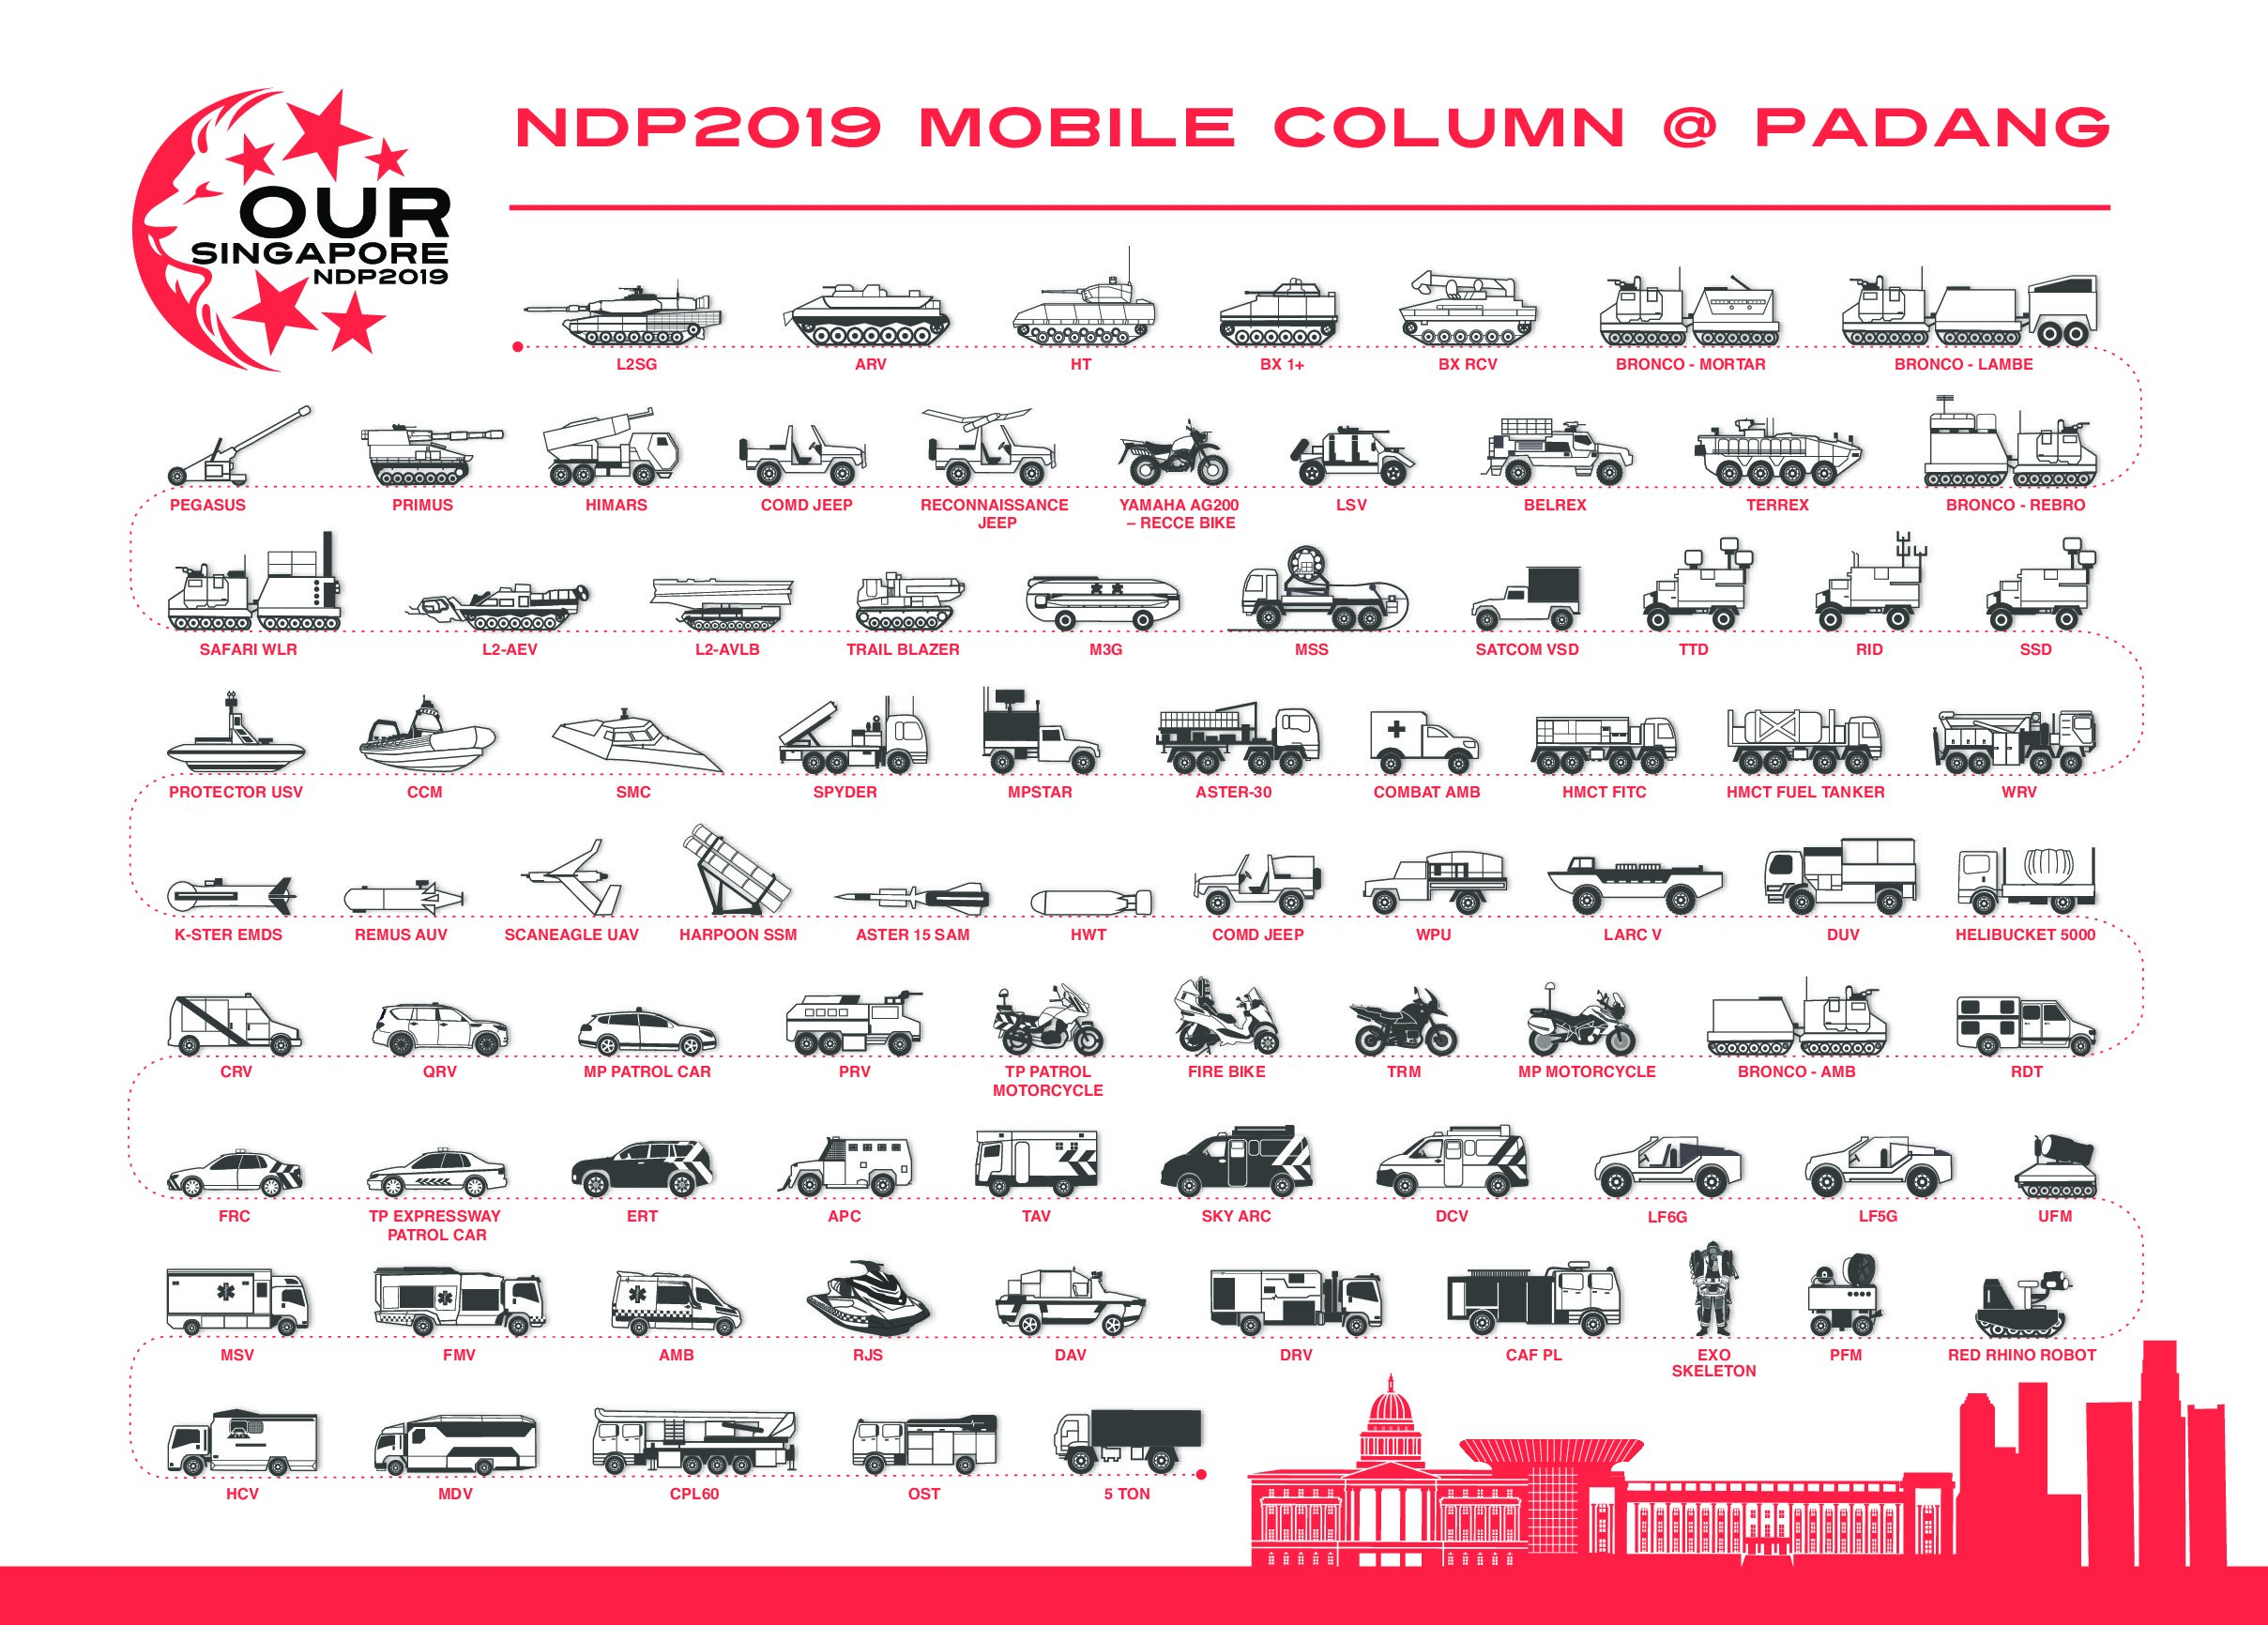 20190808 Infographic - NDP 2019 Mobile Column.jpg